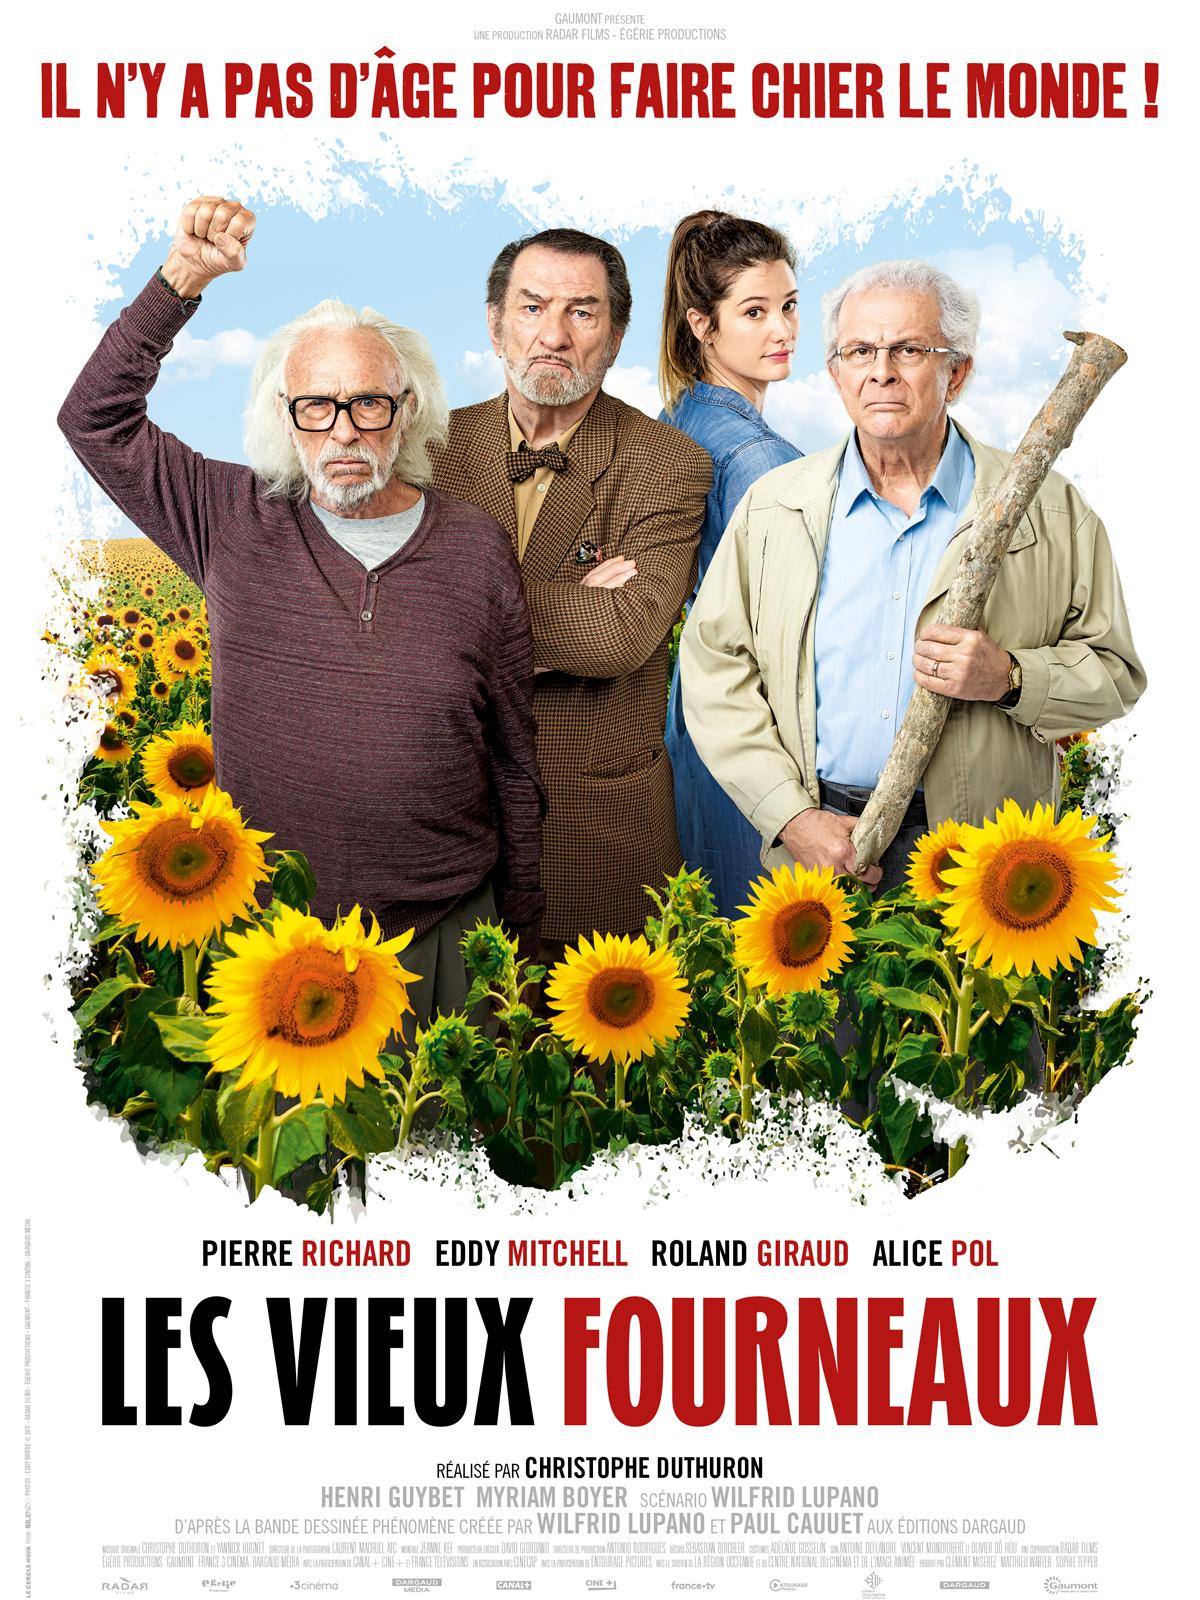 http://rss.allocine.fr/~r/ac/cine/cettesemaine/~3/o9AwFCc36OA/fichefilm_gen_cfilm=257873.html